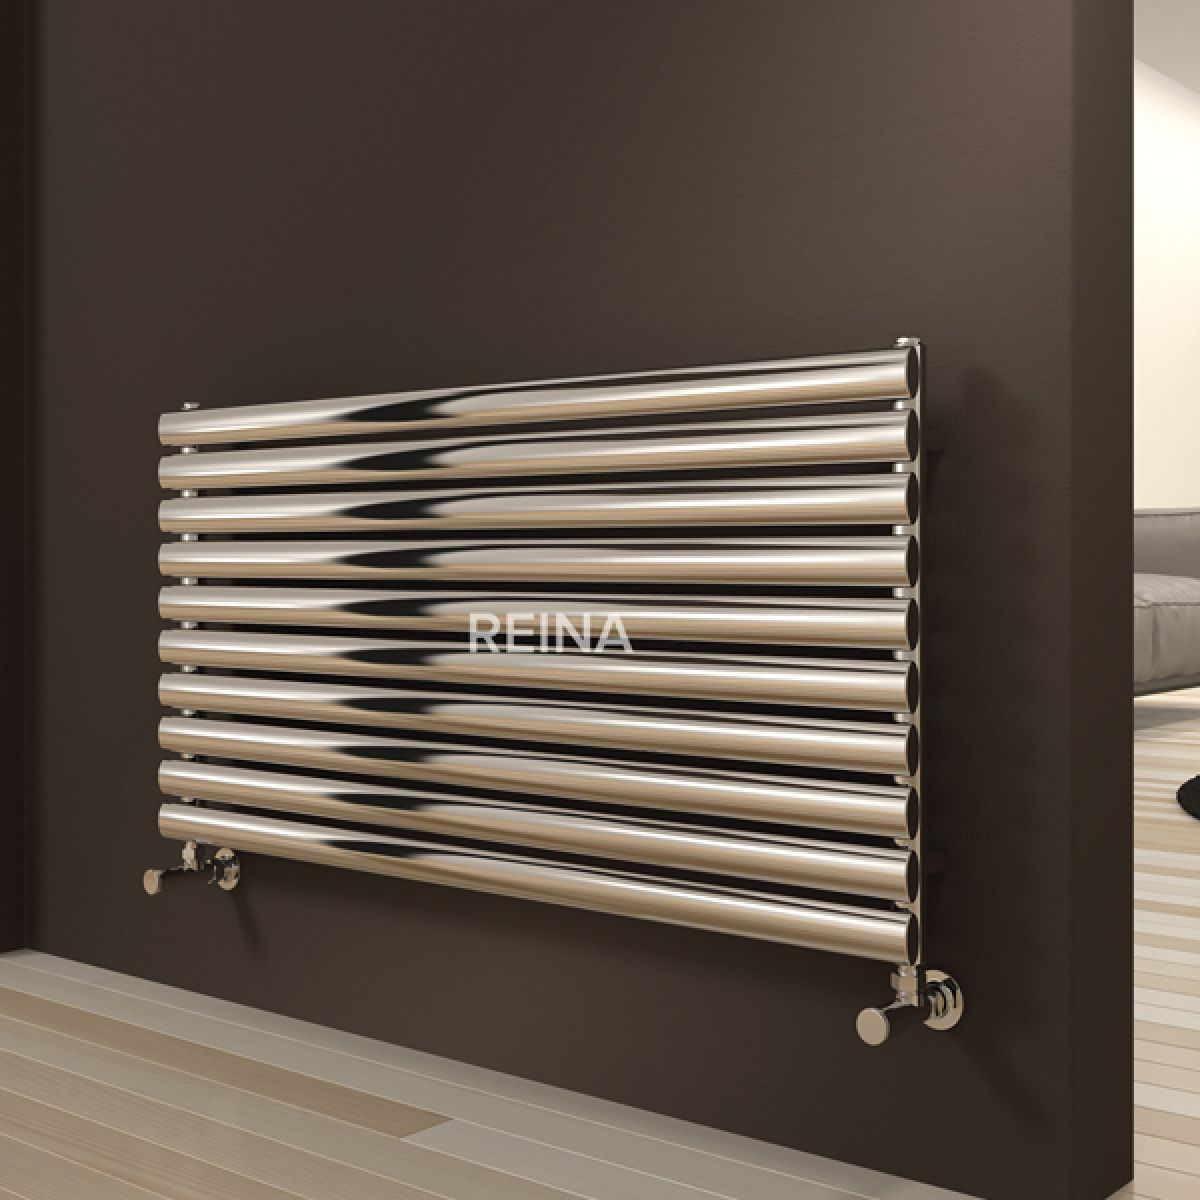 Reina Artena Polished Single Panel Steel Radiator 590 x 600mm